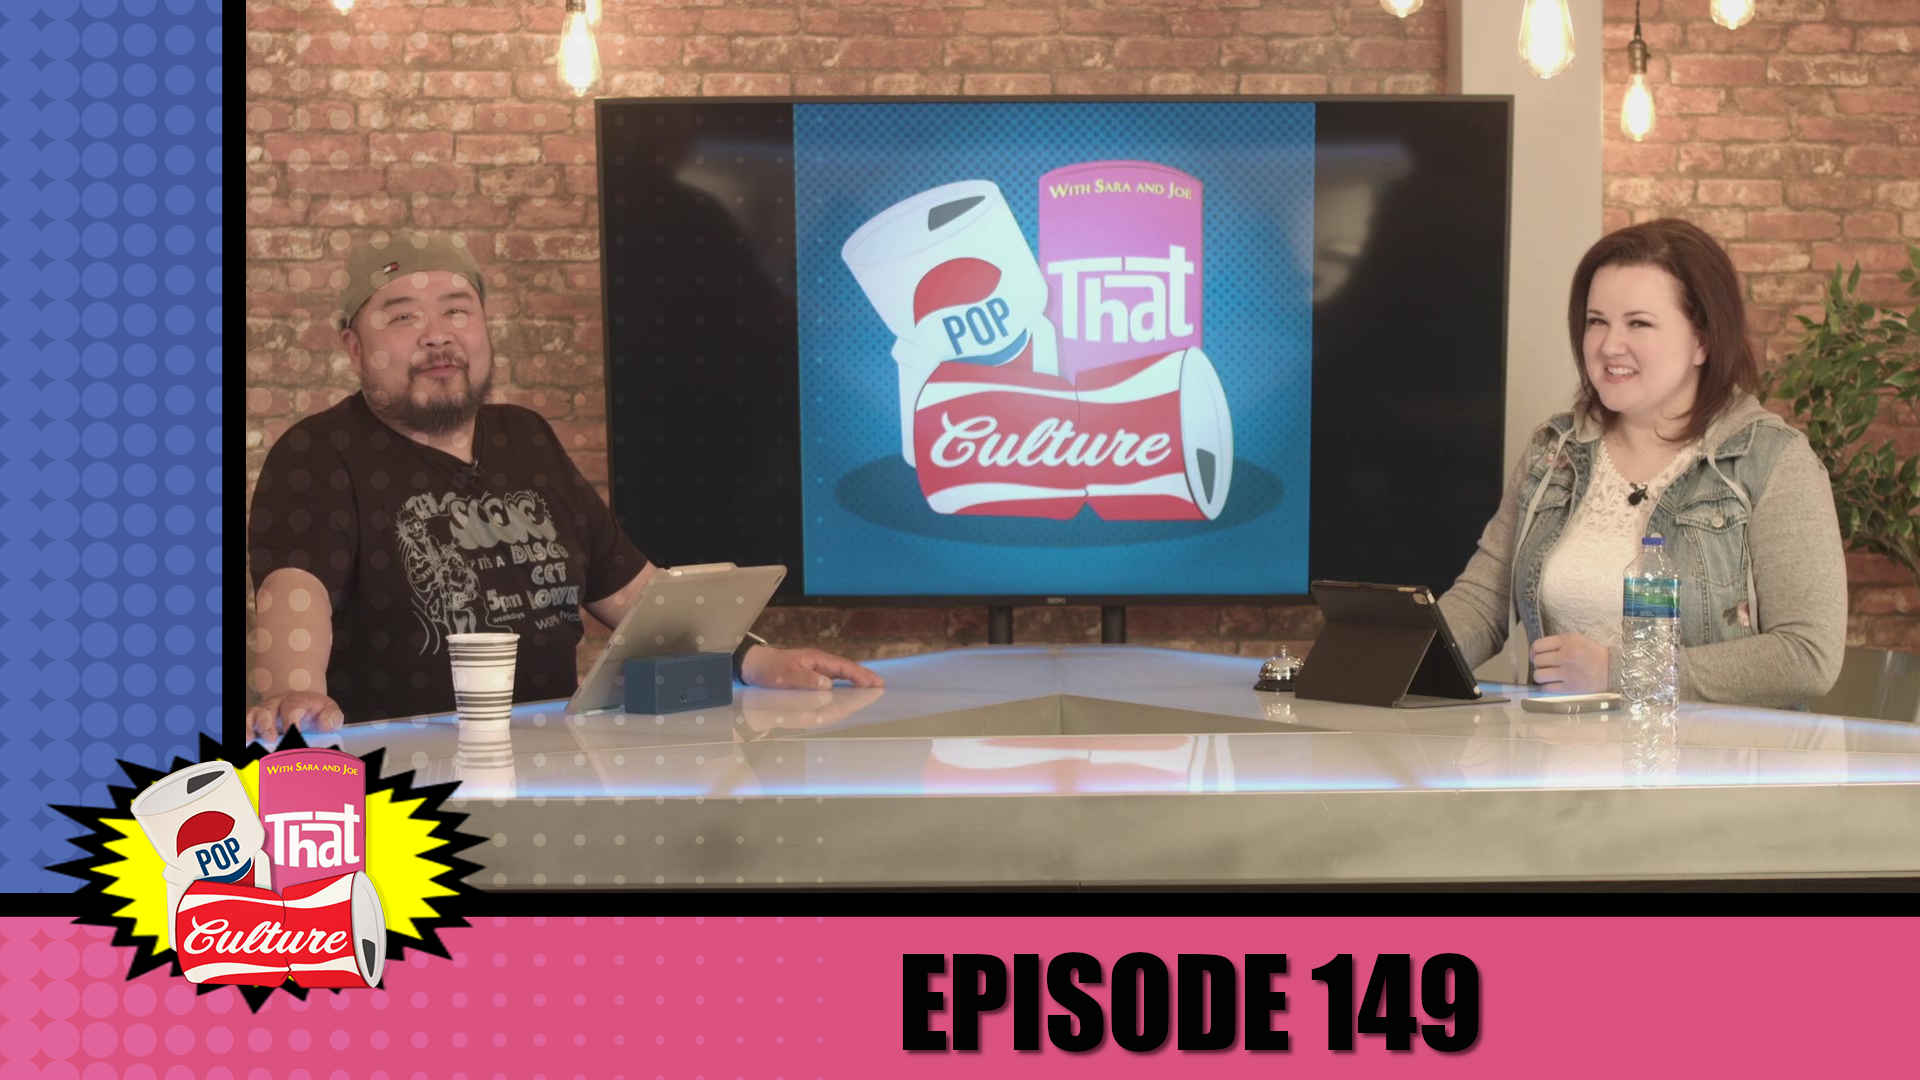 Pop That Culture - Episode 149